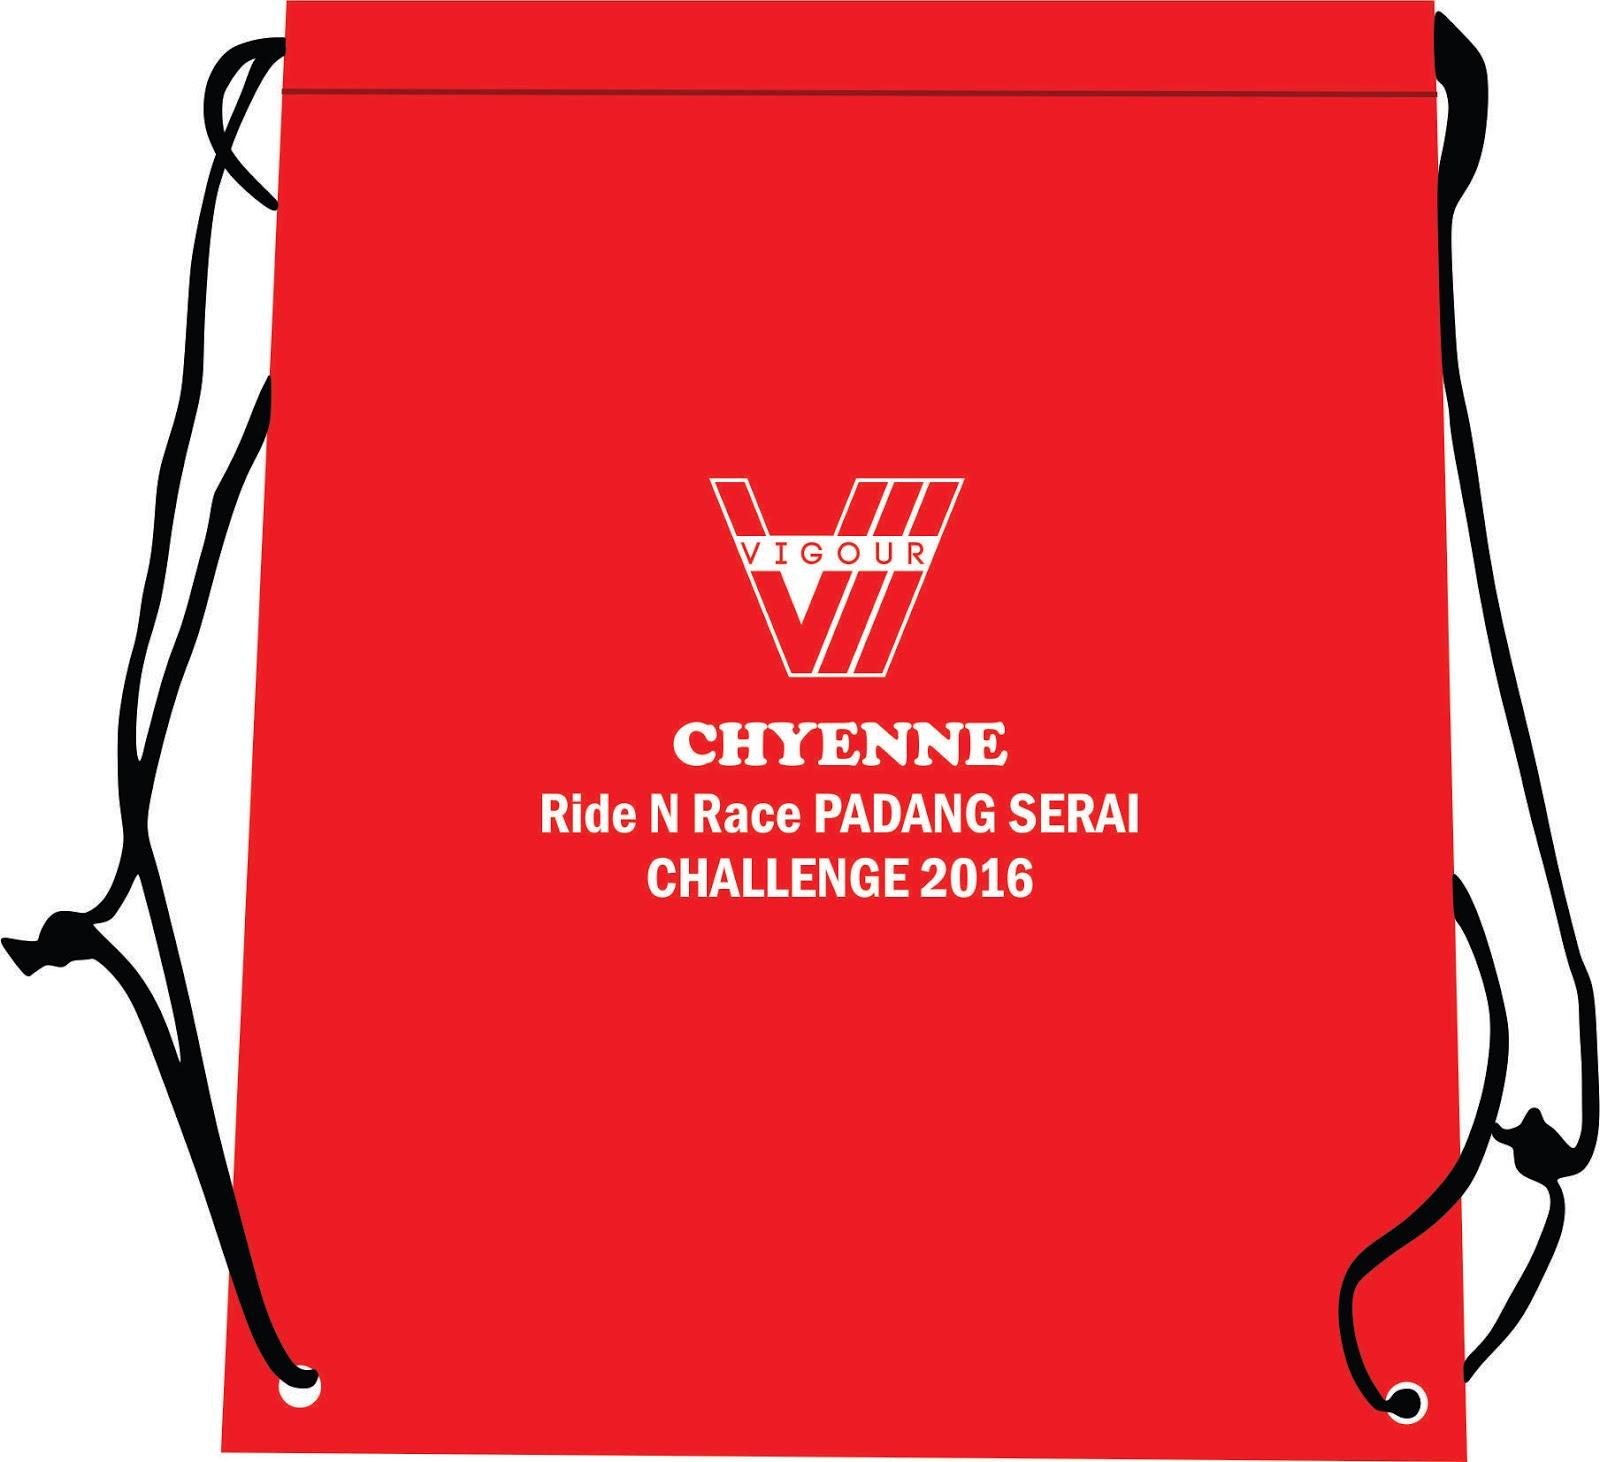 Chyenne 'Ride n Race' Padang Serai Challenge: Baju T / T-shirt / Medal